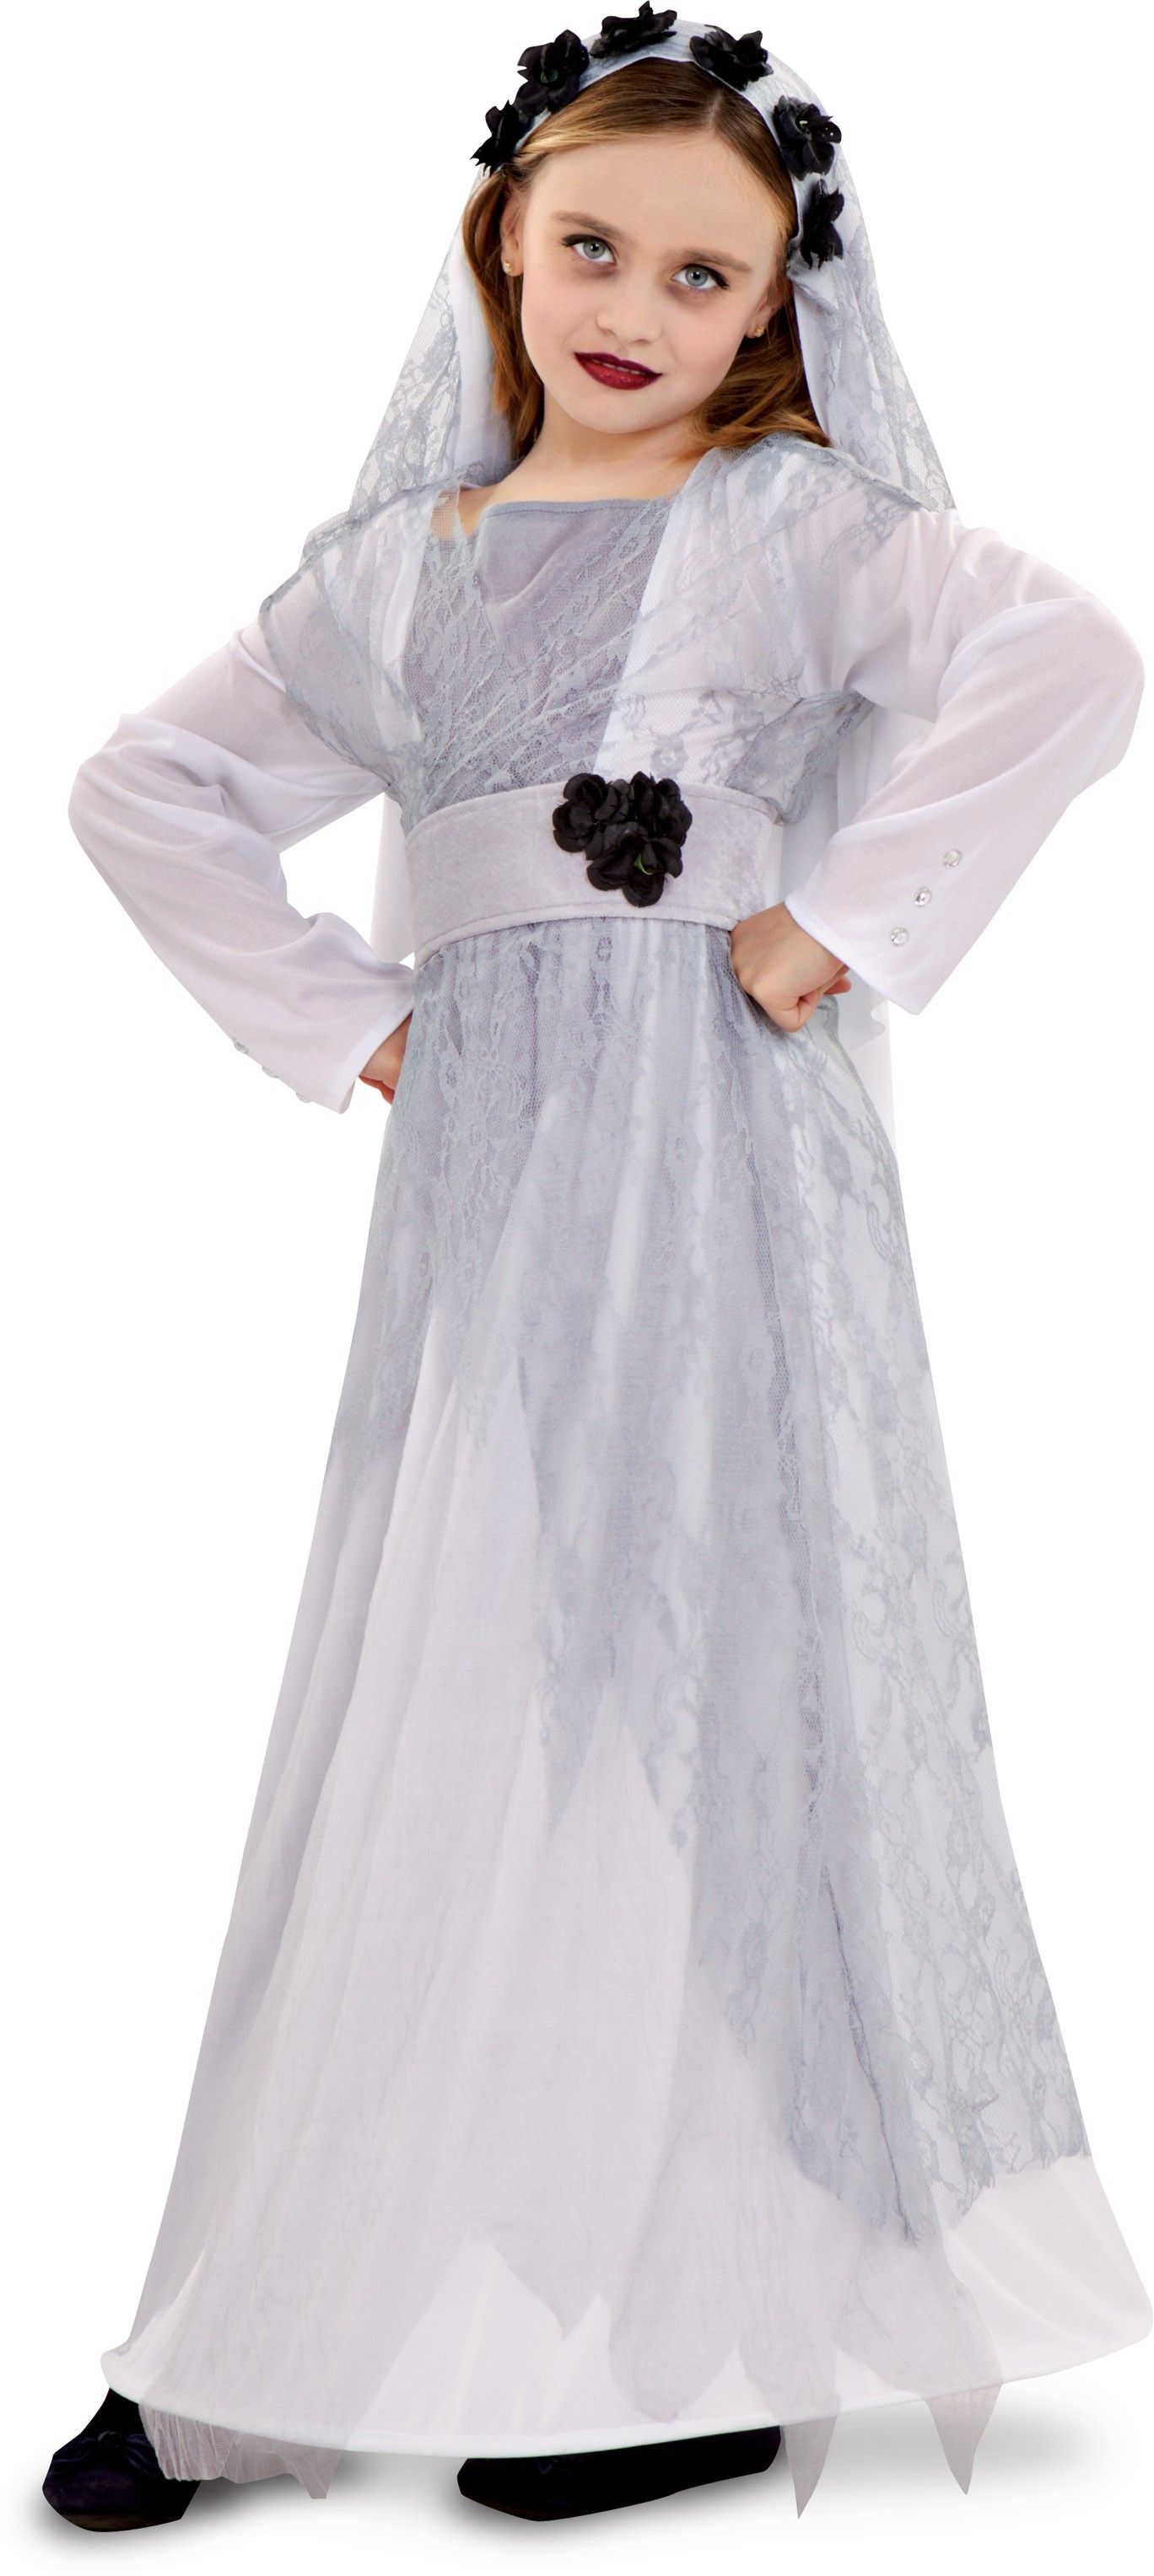 Vestidos para fiesta de halloween para ninas